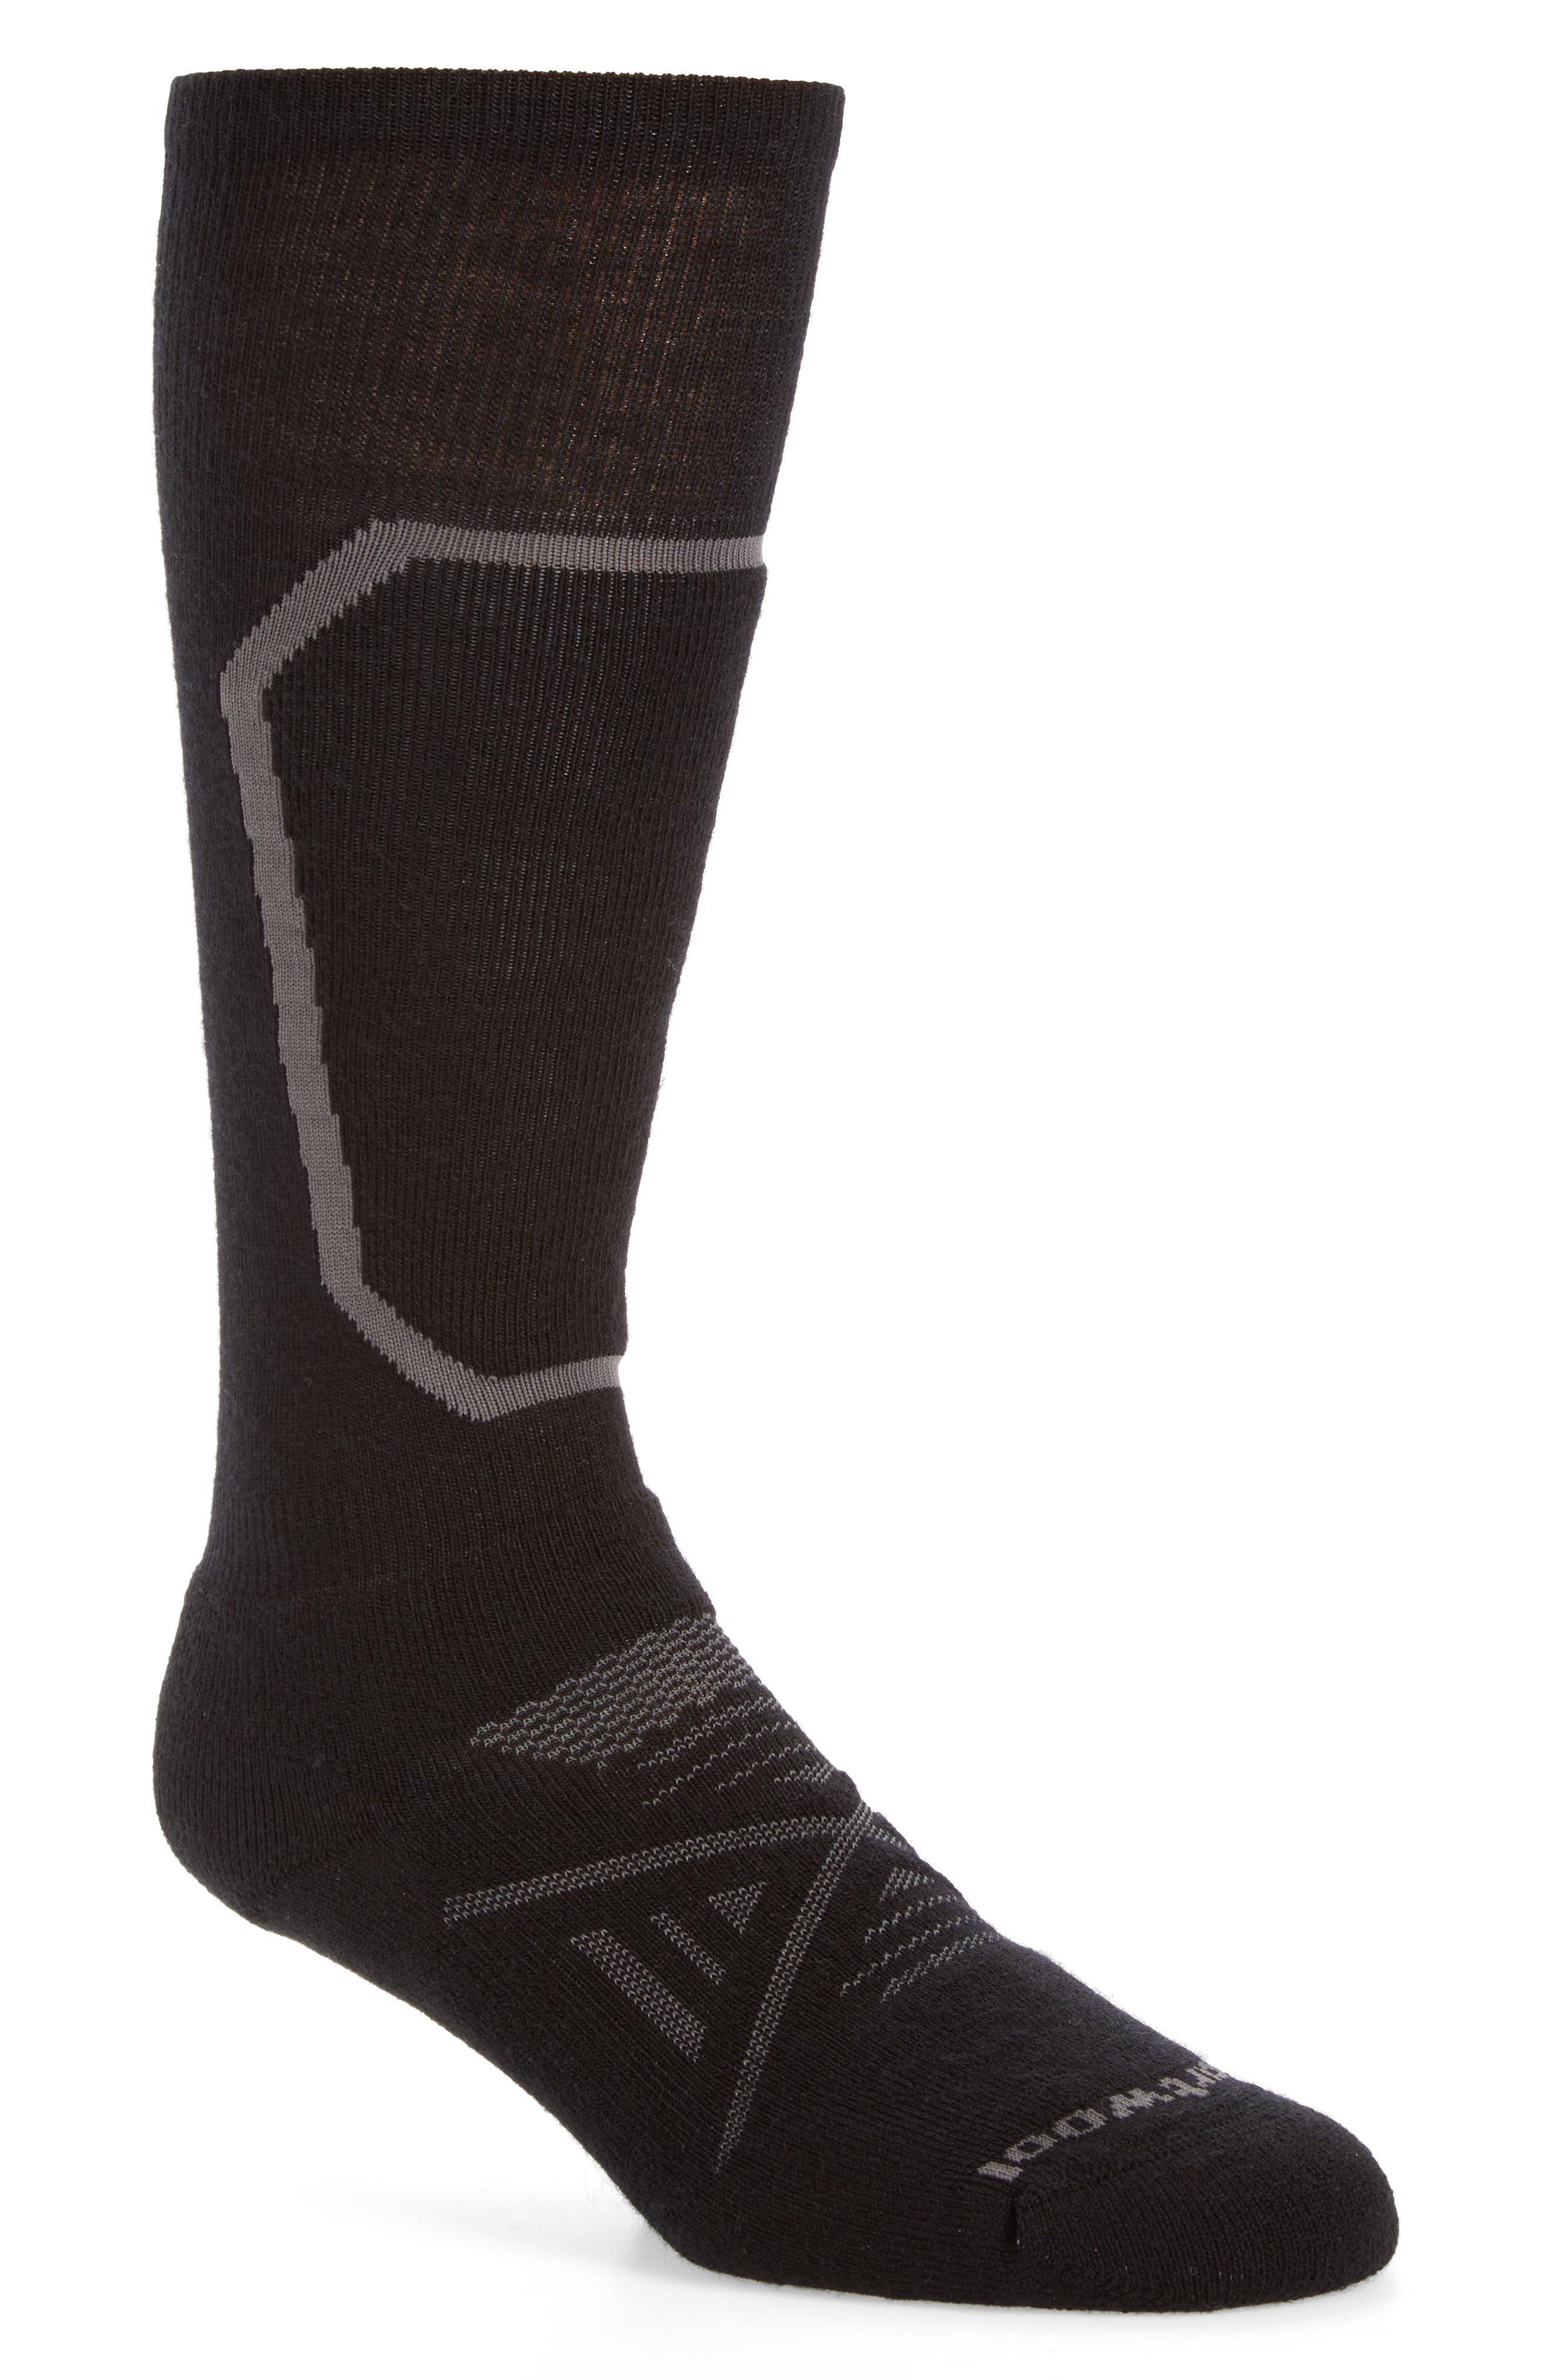 PhD<sup>®</sup> Ski Medium Over the Calf Socks,                             Alternate thumbnail 2, color,                             001